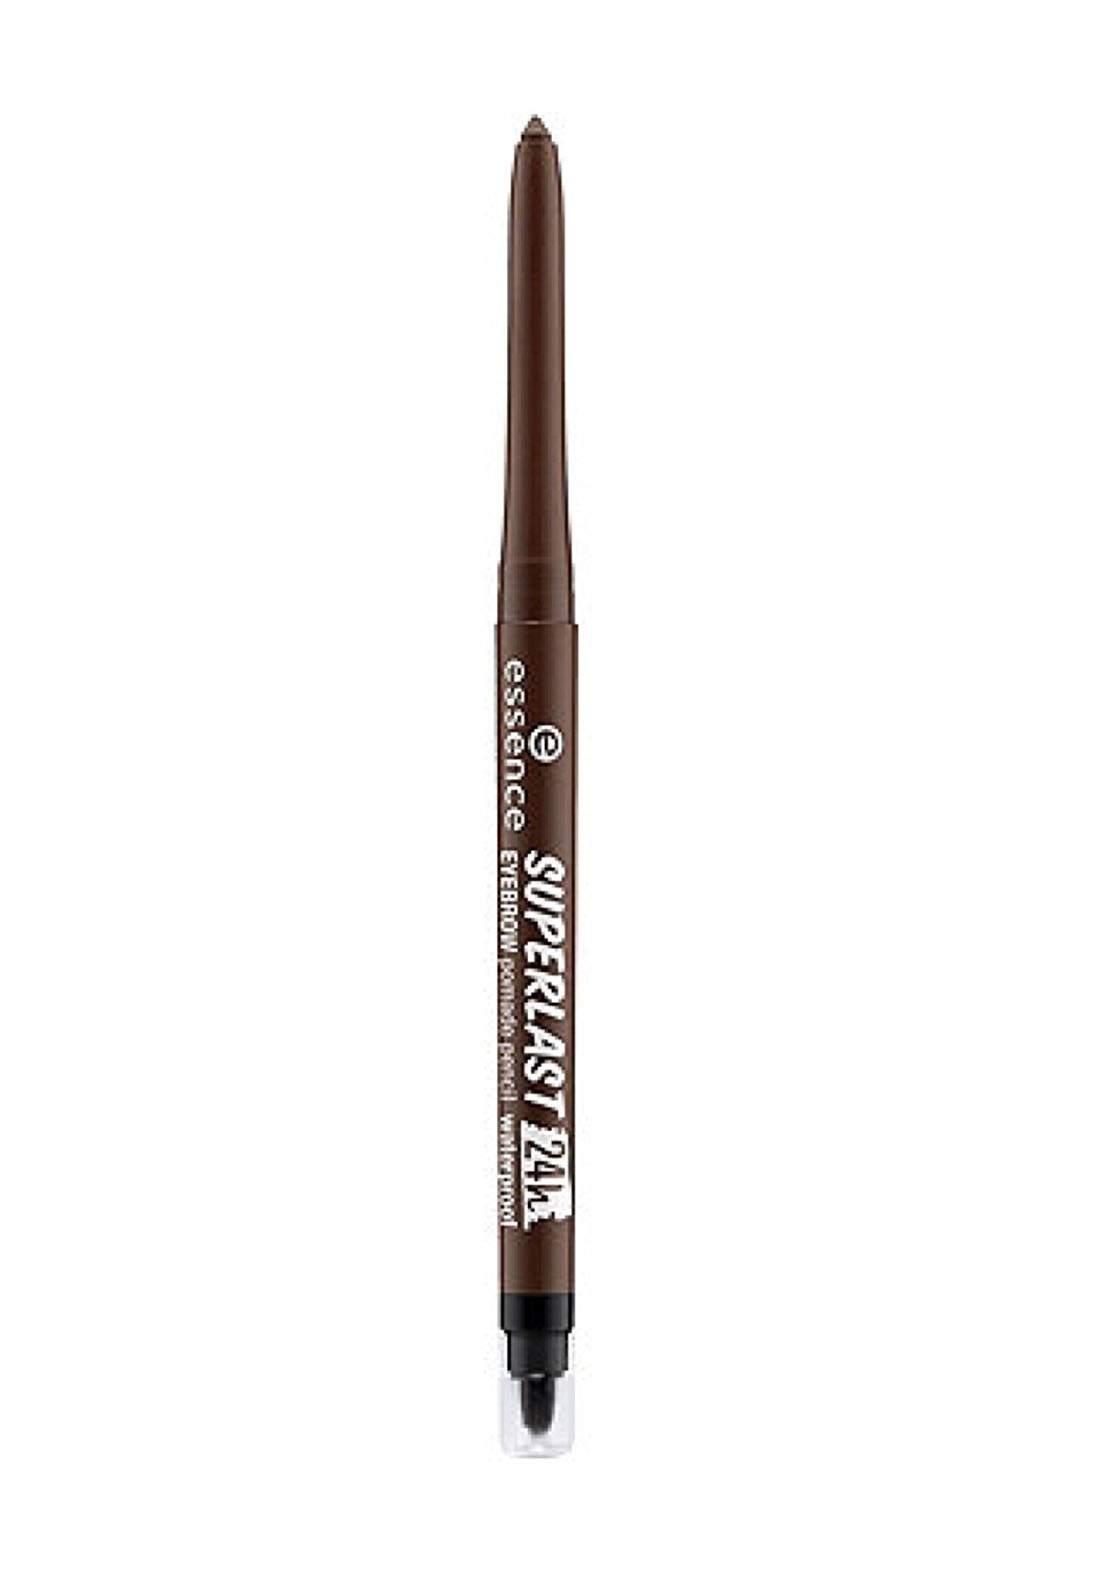 Essence Superlast Eyebrow Pencil Waterproof No.30 Dark Brown قلم تحديد الحاجب